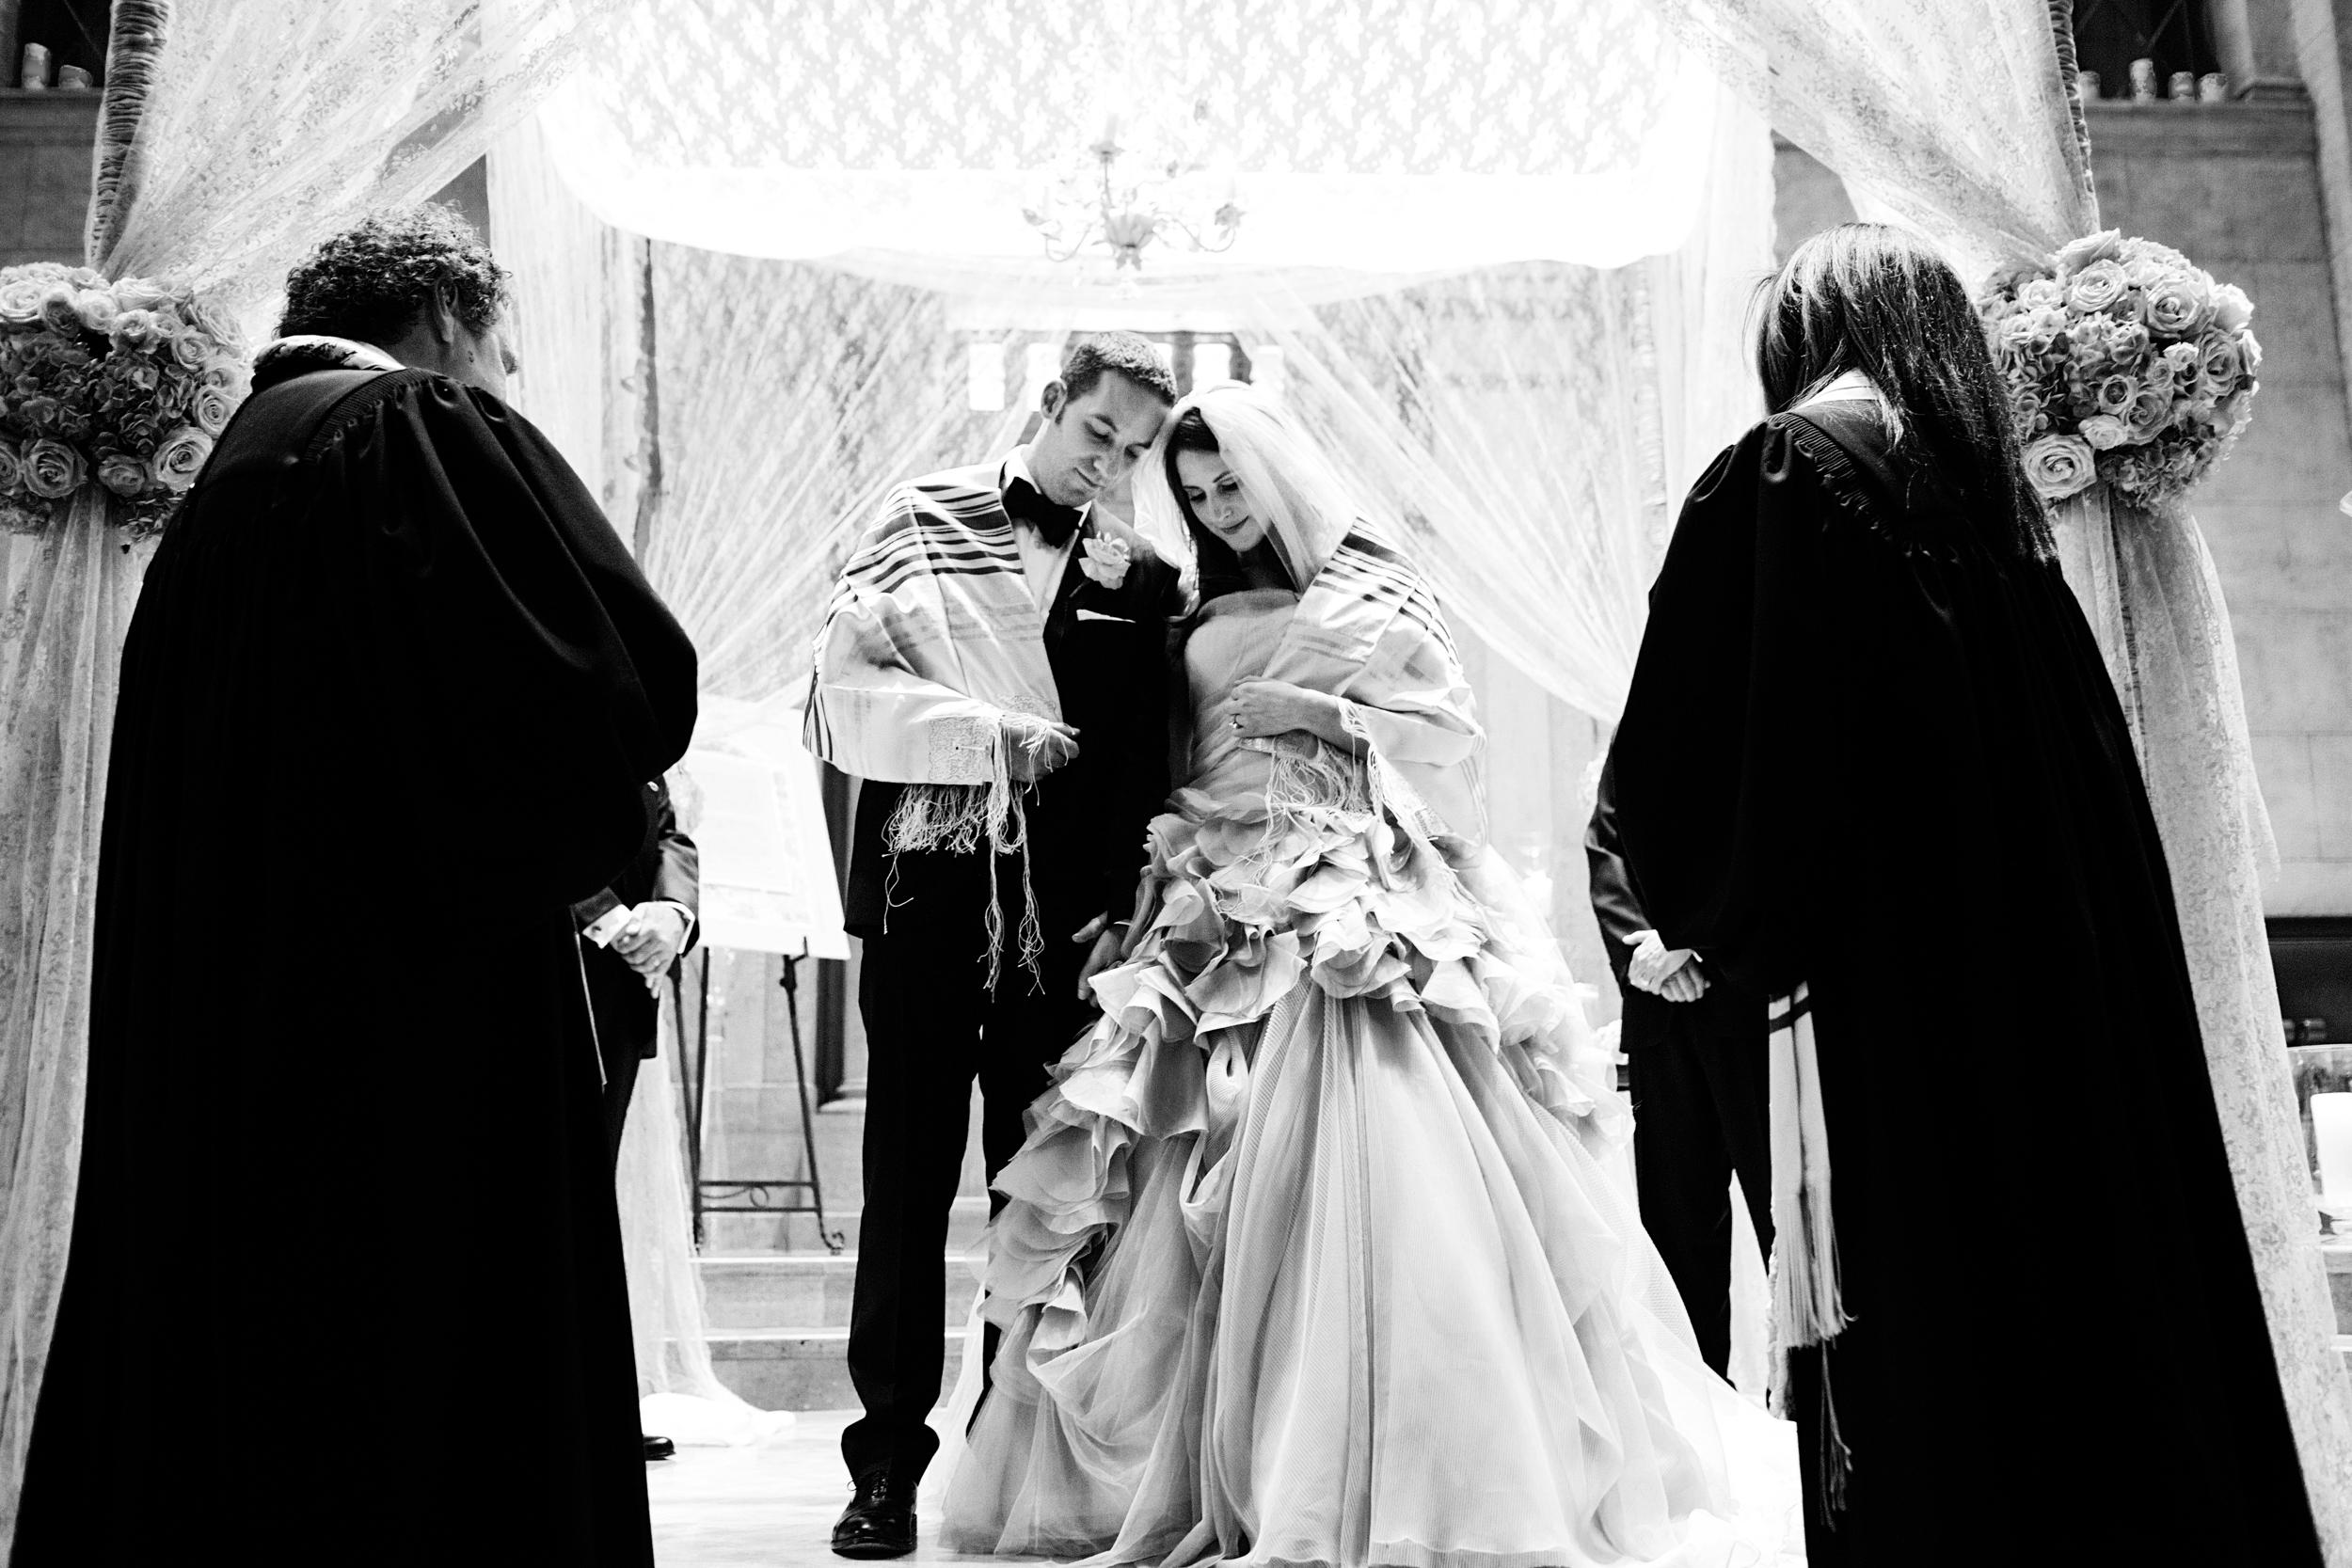 Ceci_New_York_Ceci_Style_Ceci_Johnson_Luxury_Lifestyle_Floral_Lace_Wedding_Letterpress_Inspiration_Design_Custom_Couture_Personalized_Invitations_-119.jpg